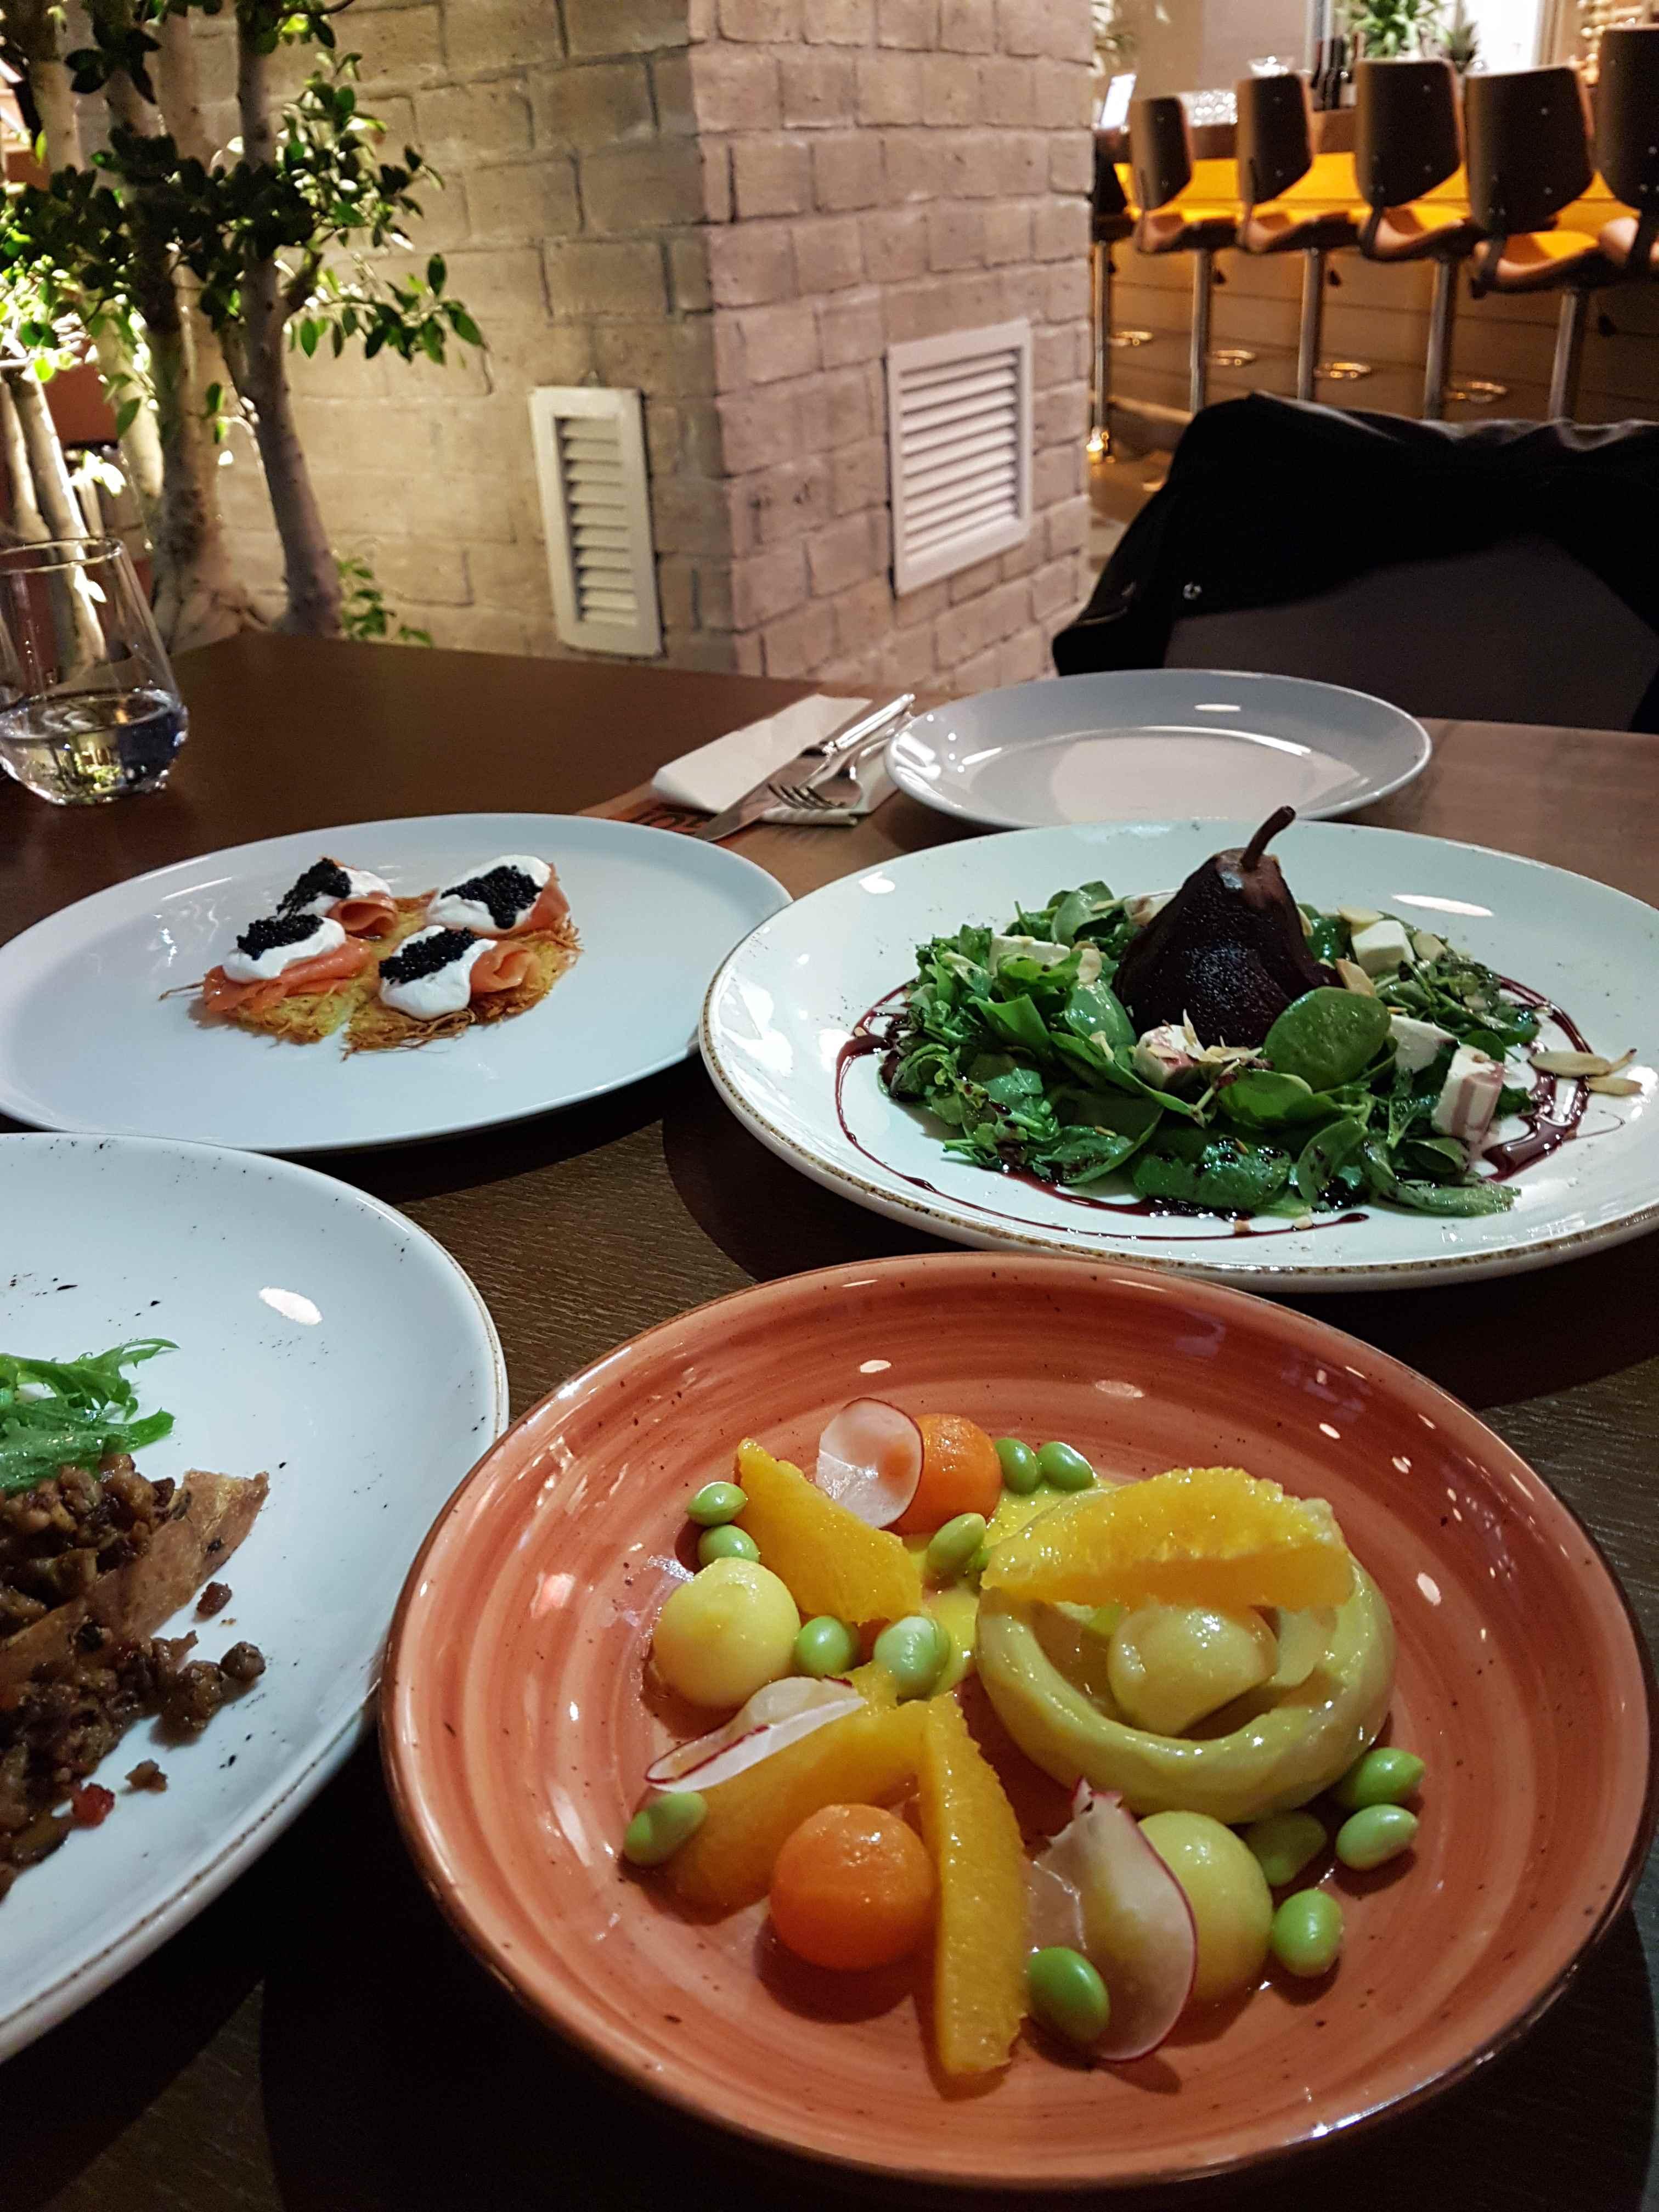 yesempatik-borgo-kitchen-bar-ortakoy-ulus-yemek-saglikli